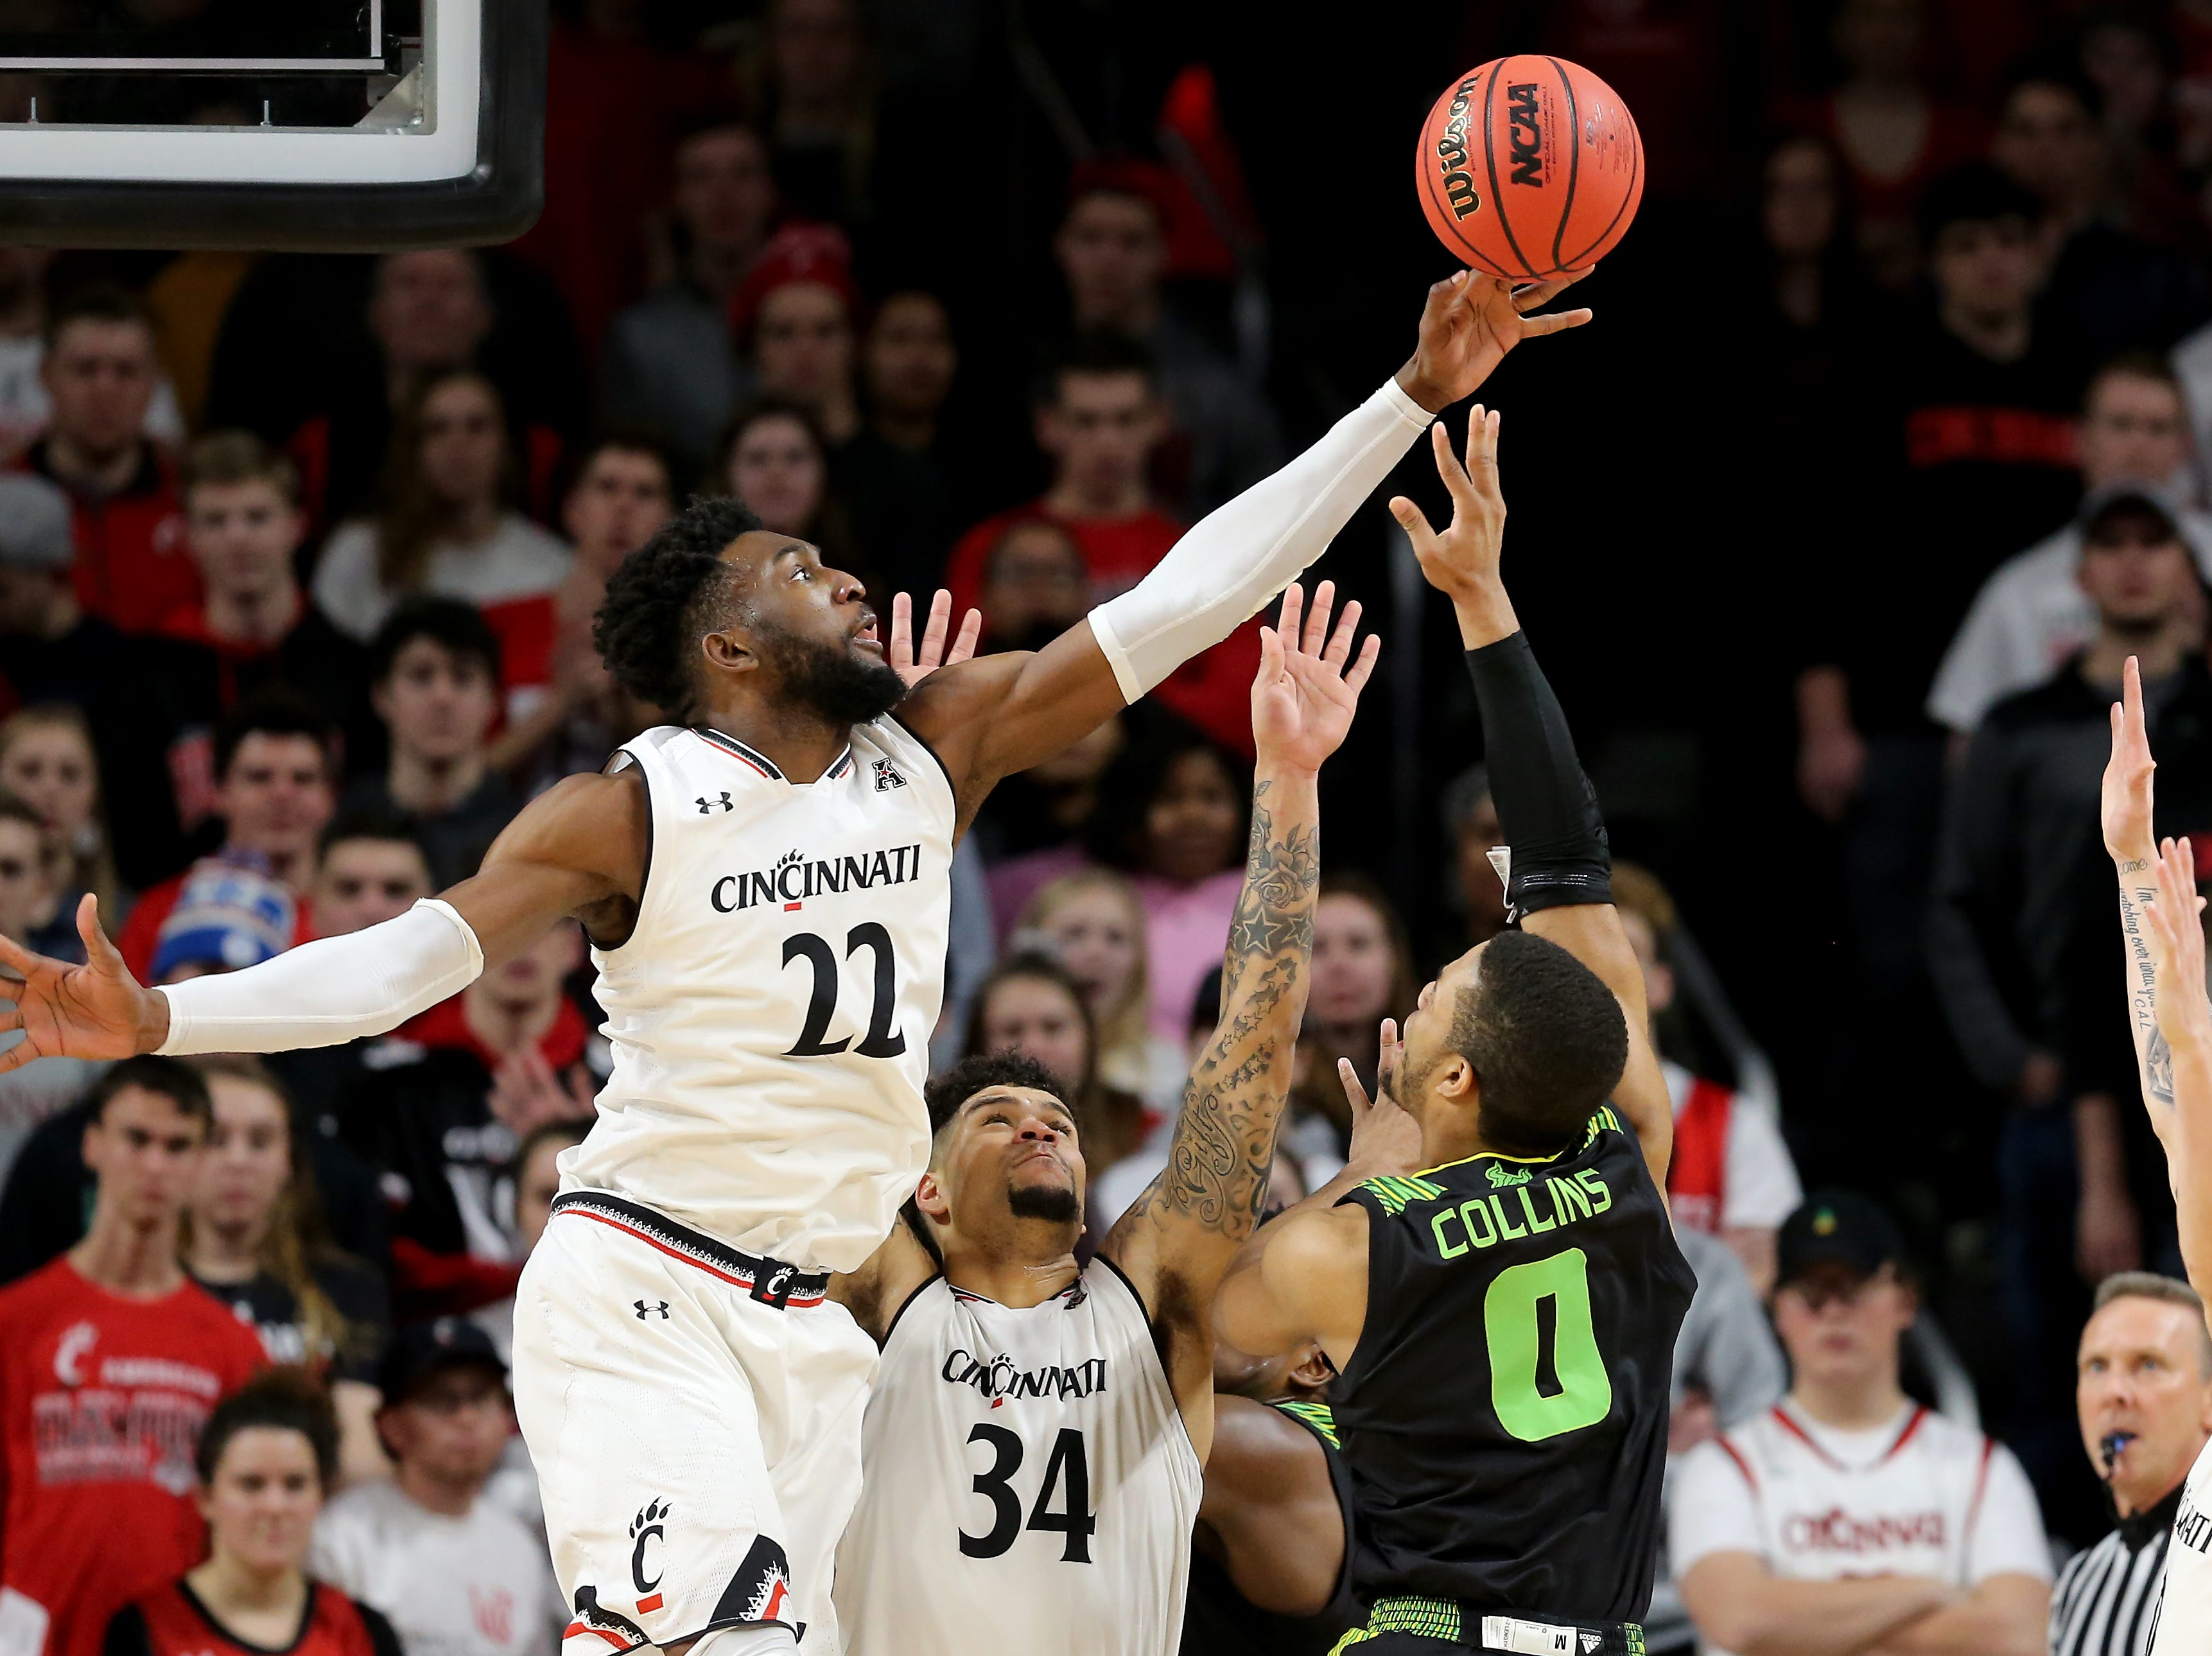 Cincinnati Bearcats forward Eliel Nsoseme (22) blocks South Florida Bulls guard David Collins' (0) shot in the first half of an NCAA college basketball game, Tuesday, Jan. 15, 2019, at Fifth Third Arena in Cincinnati.